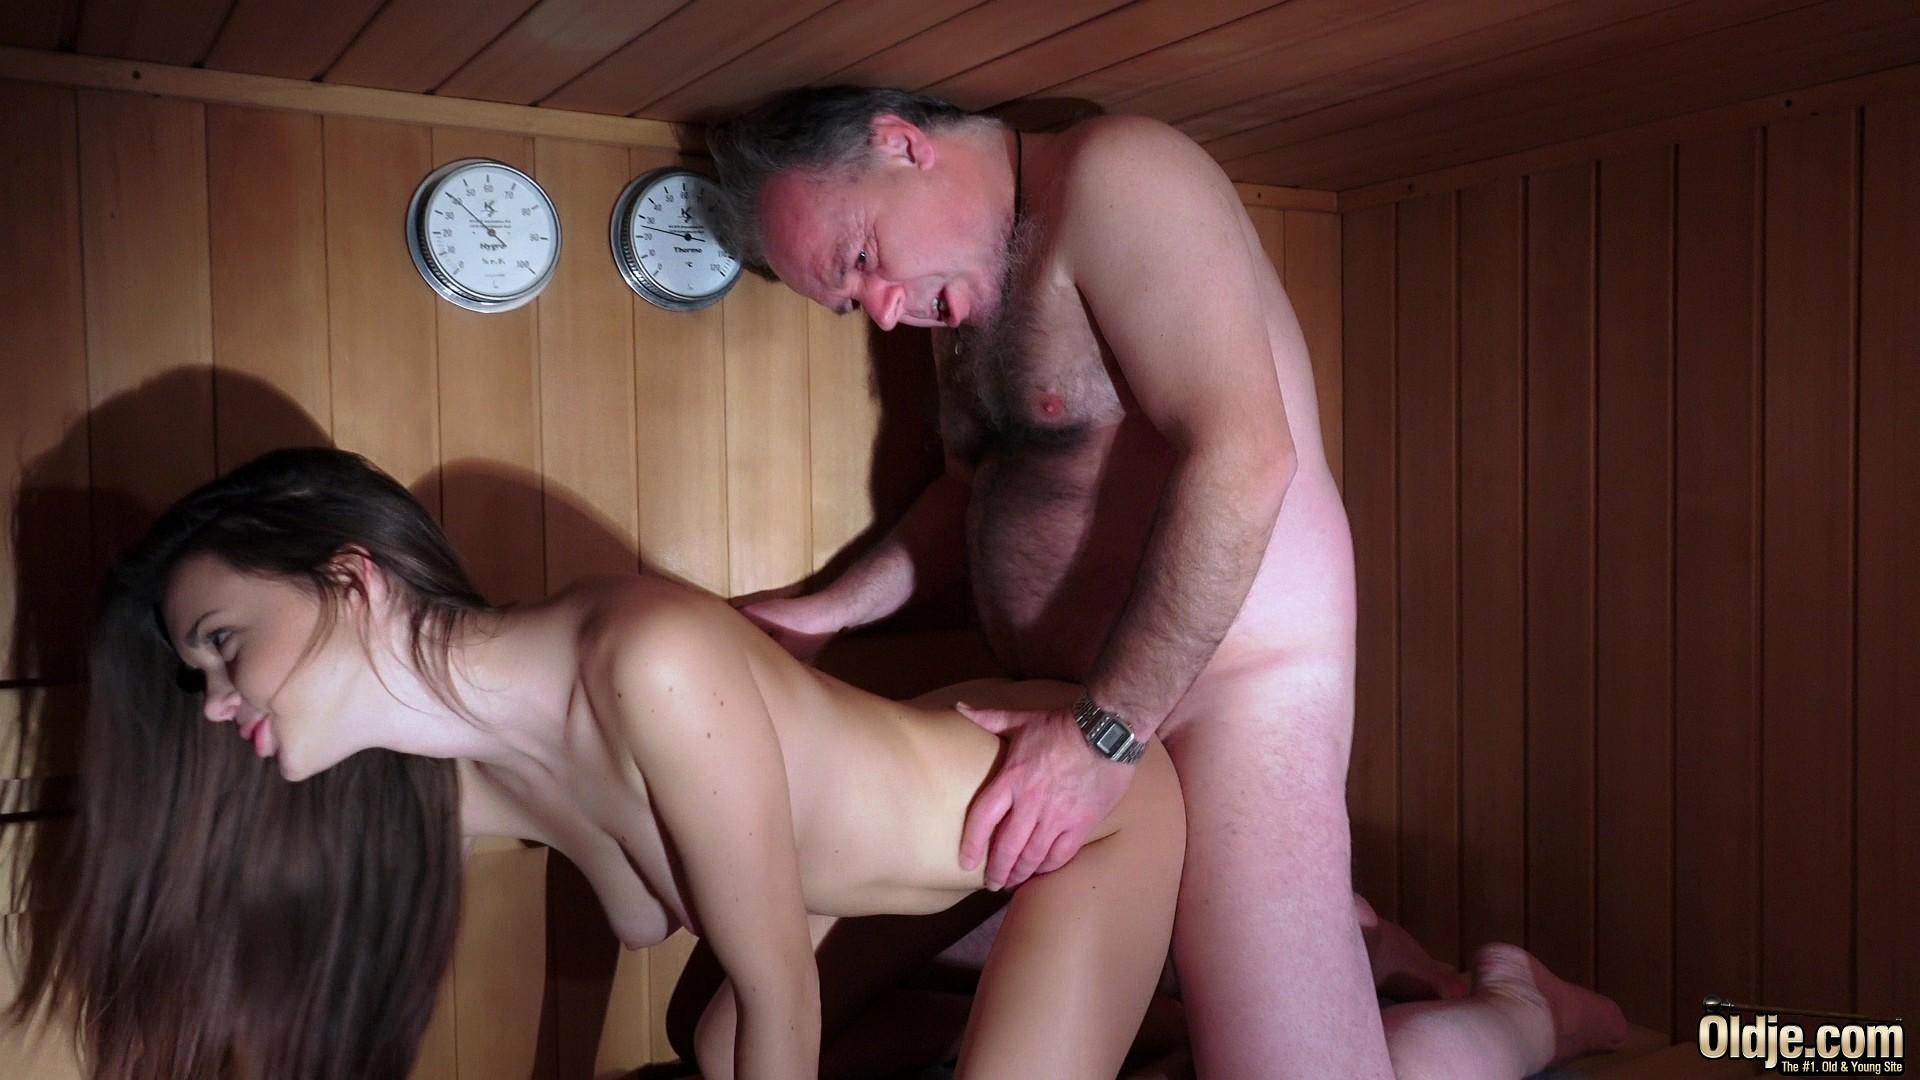 parni-v-saune-vizvali-prostitutku-video